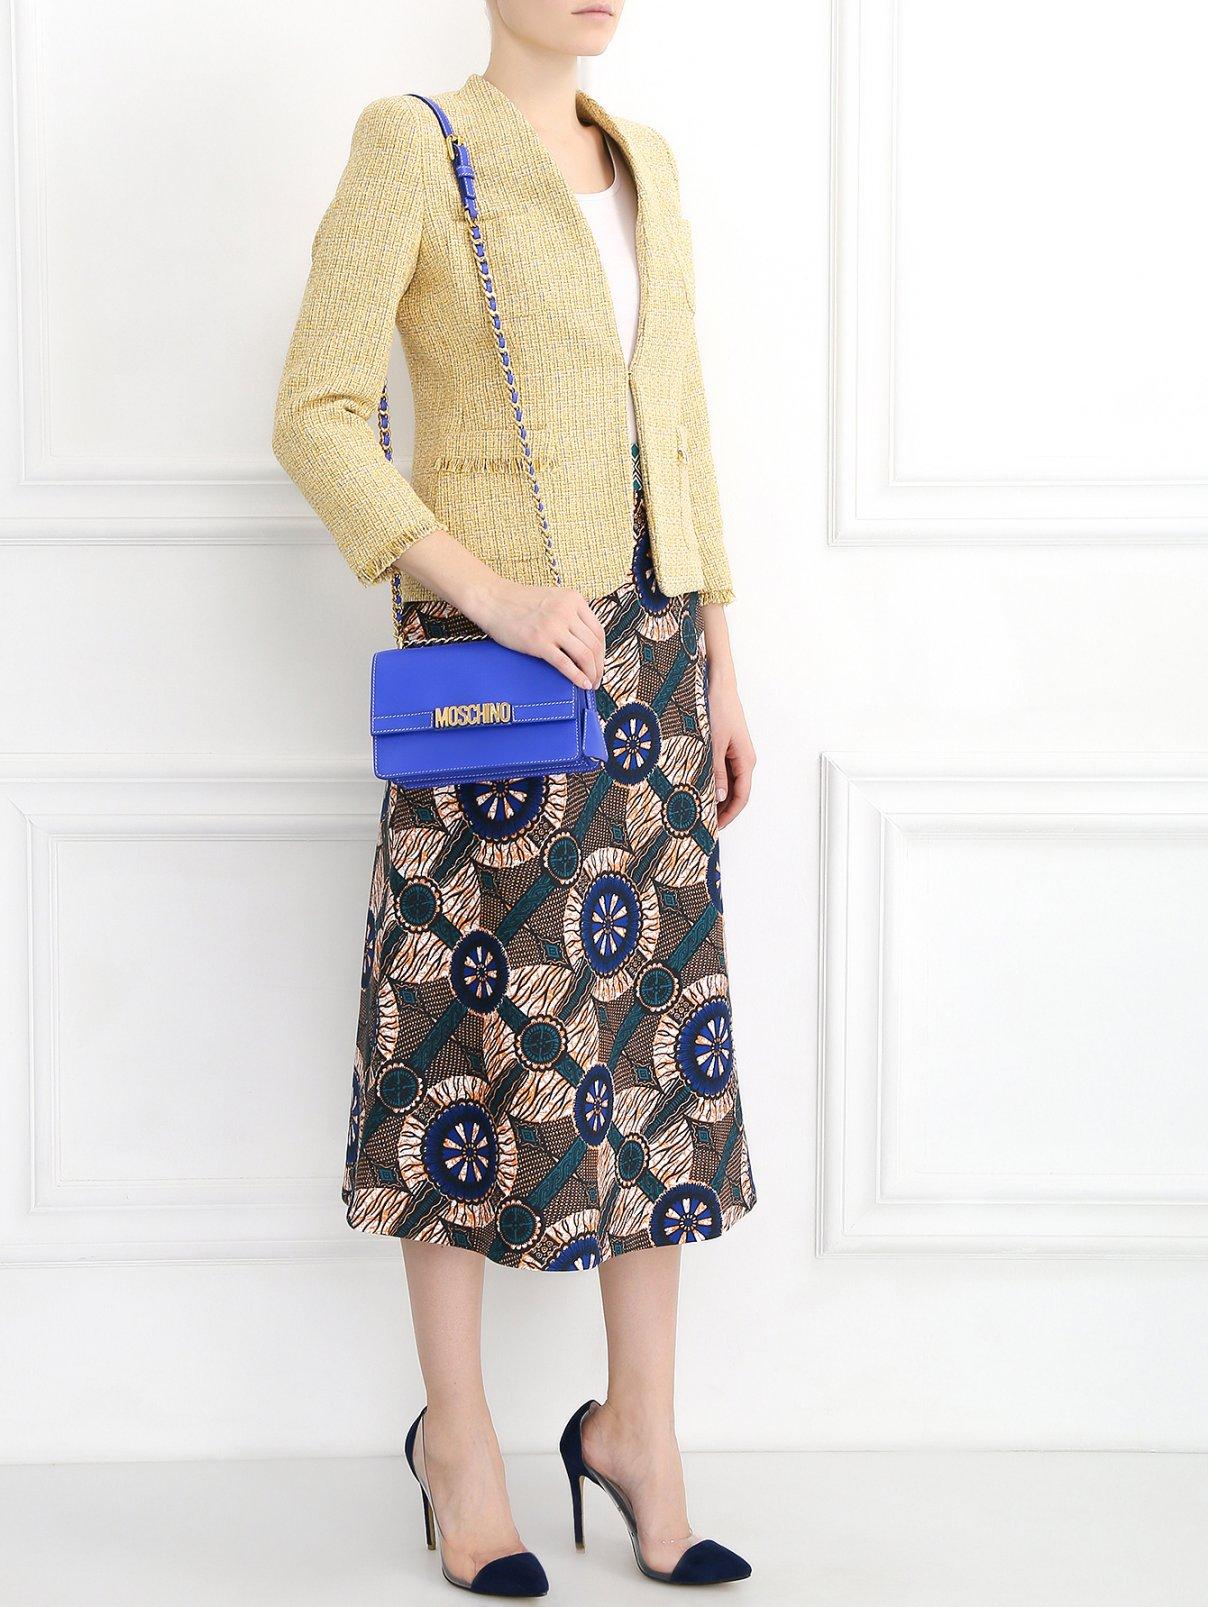 Сумка из кожи на цепочке Moschino Couture  –  Модель Общий вид